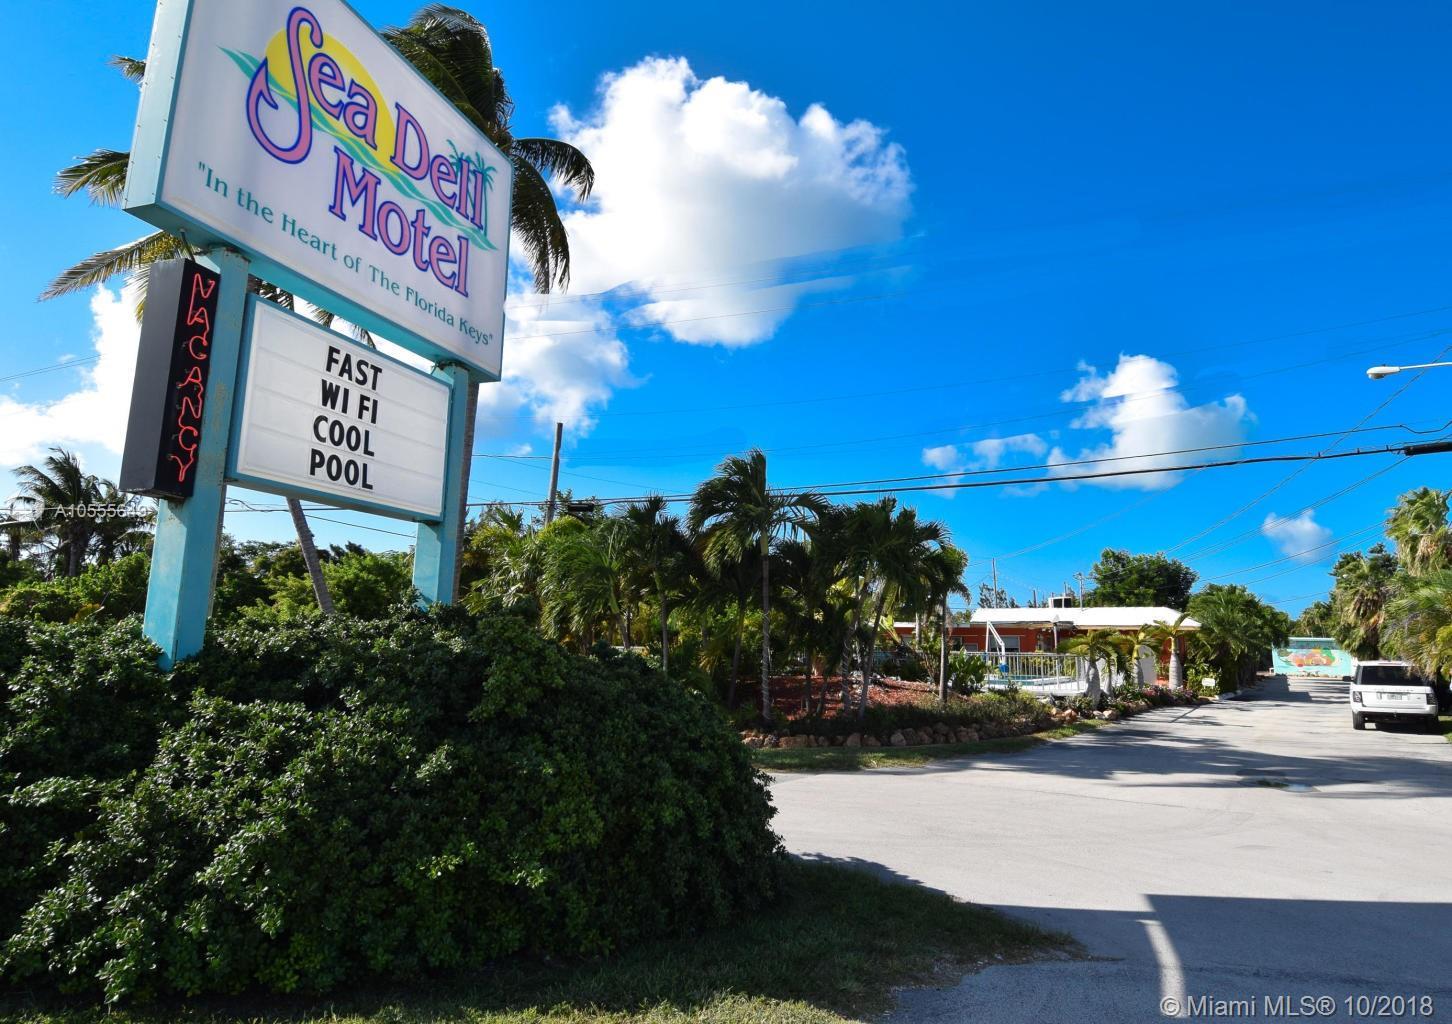 5000 Overseas Hwy., Other City - Keys/Islands/Caribb, FL 33050 - Other City - Keys/Islands/Caribb, FL real estate listing